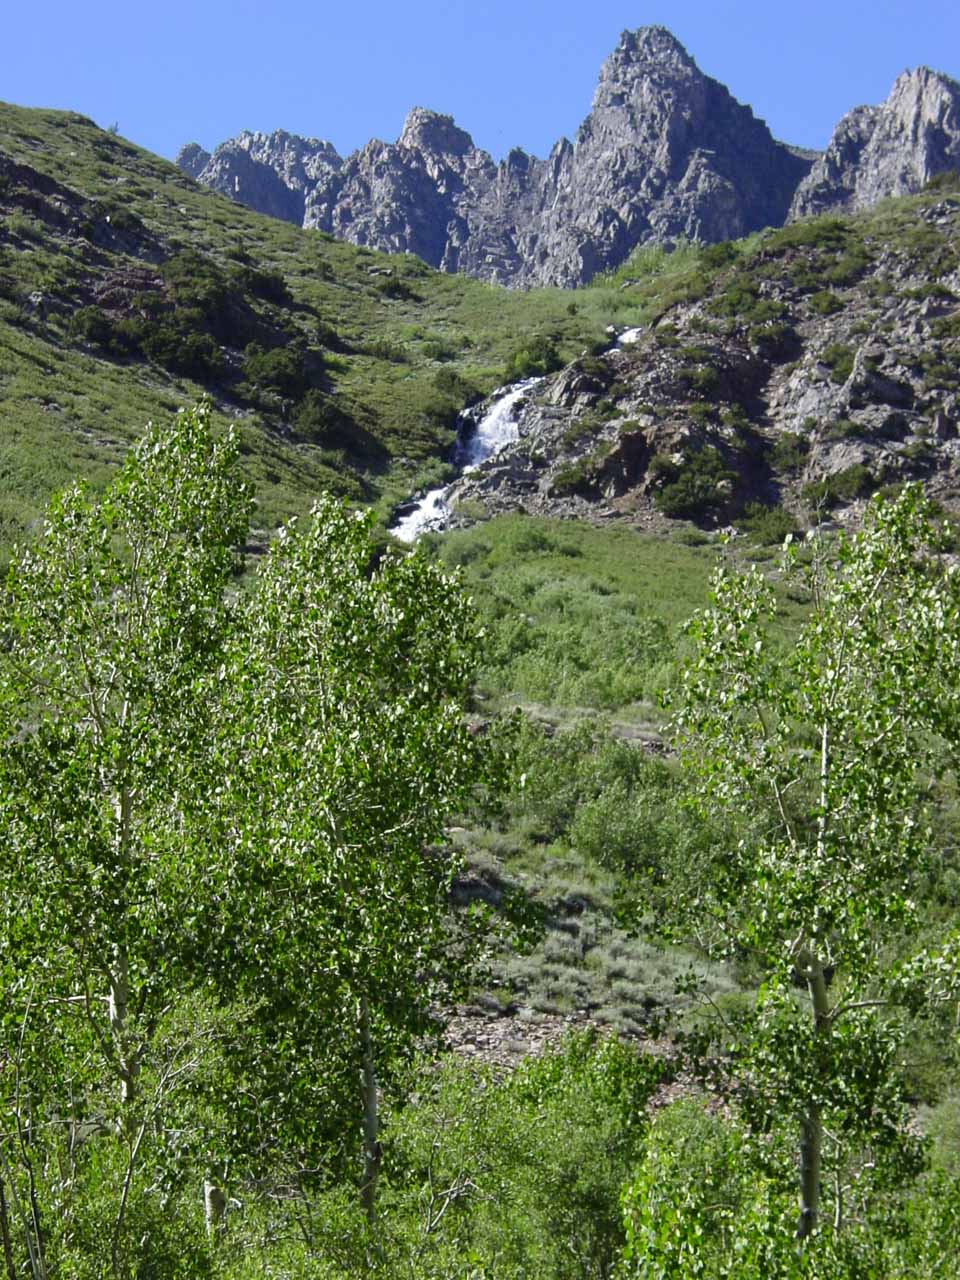 A cascade tumbling down the mountainside